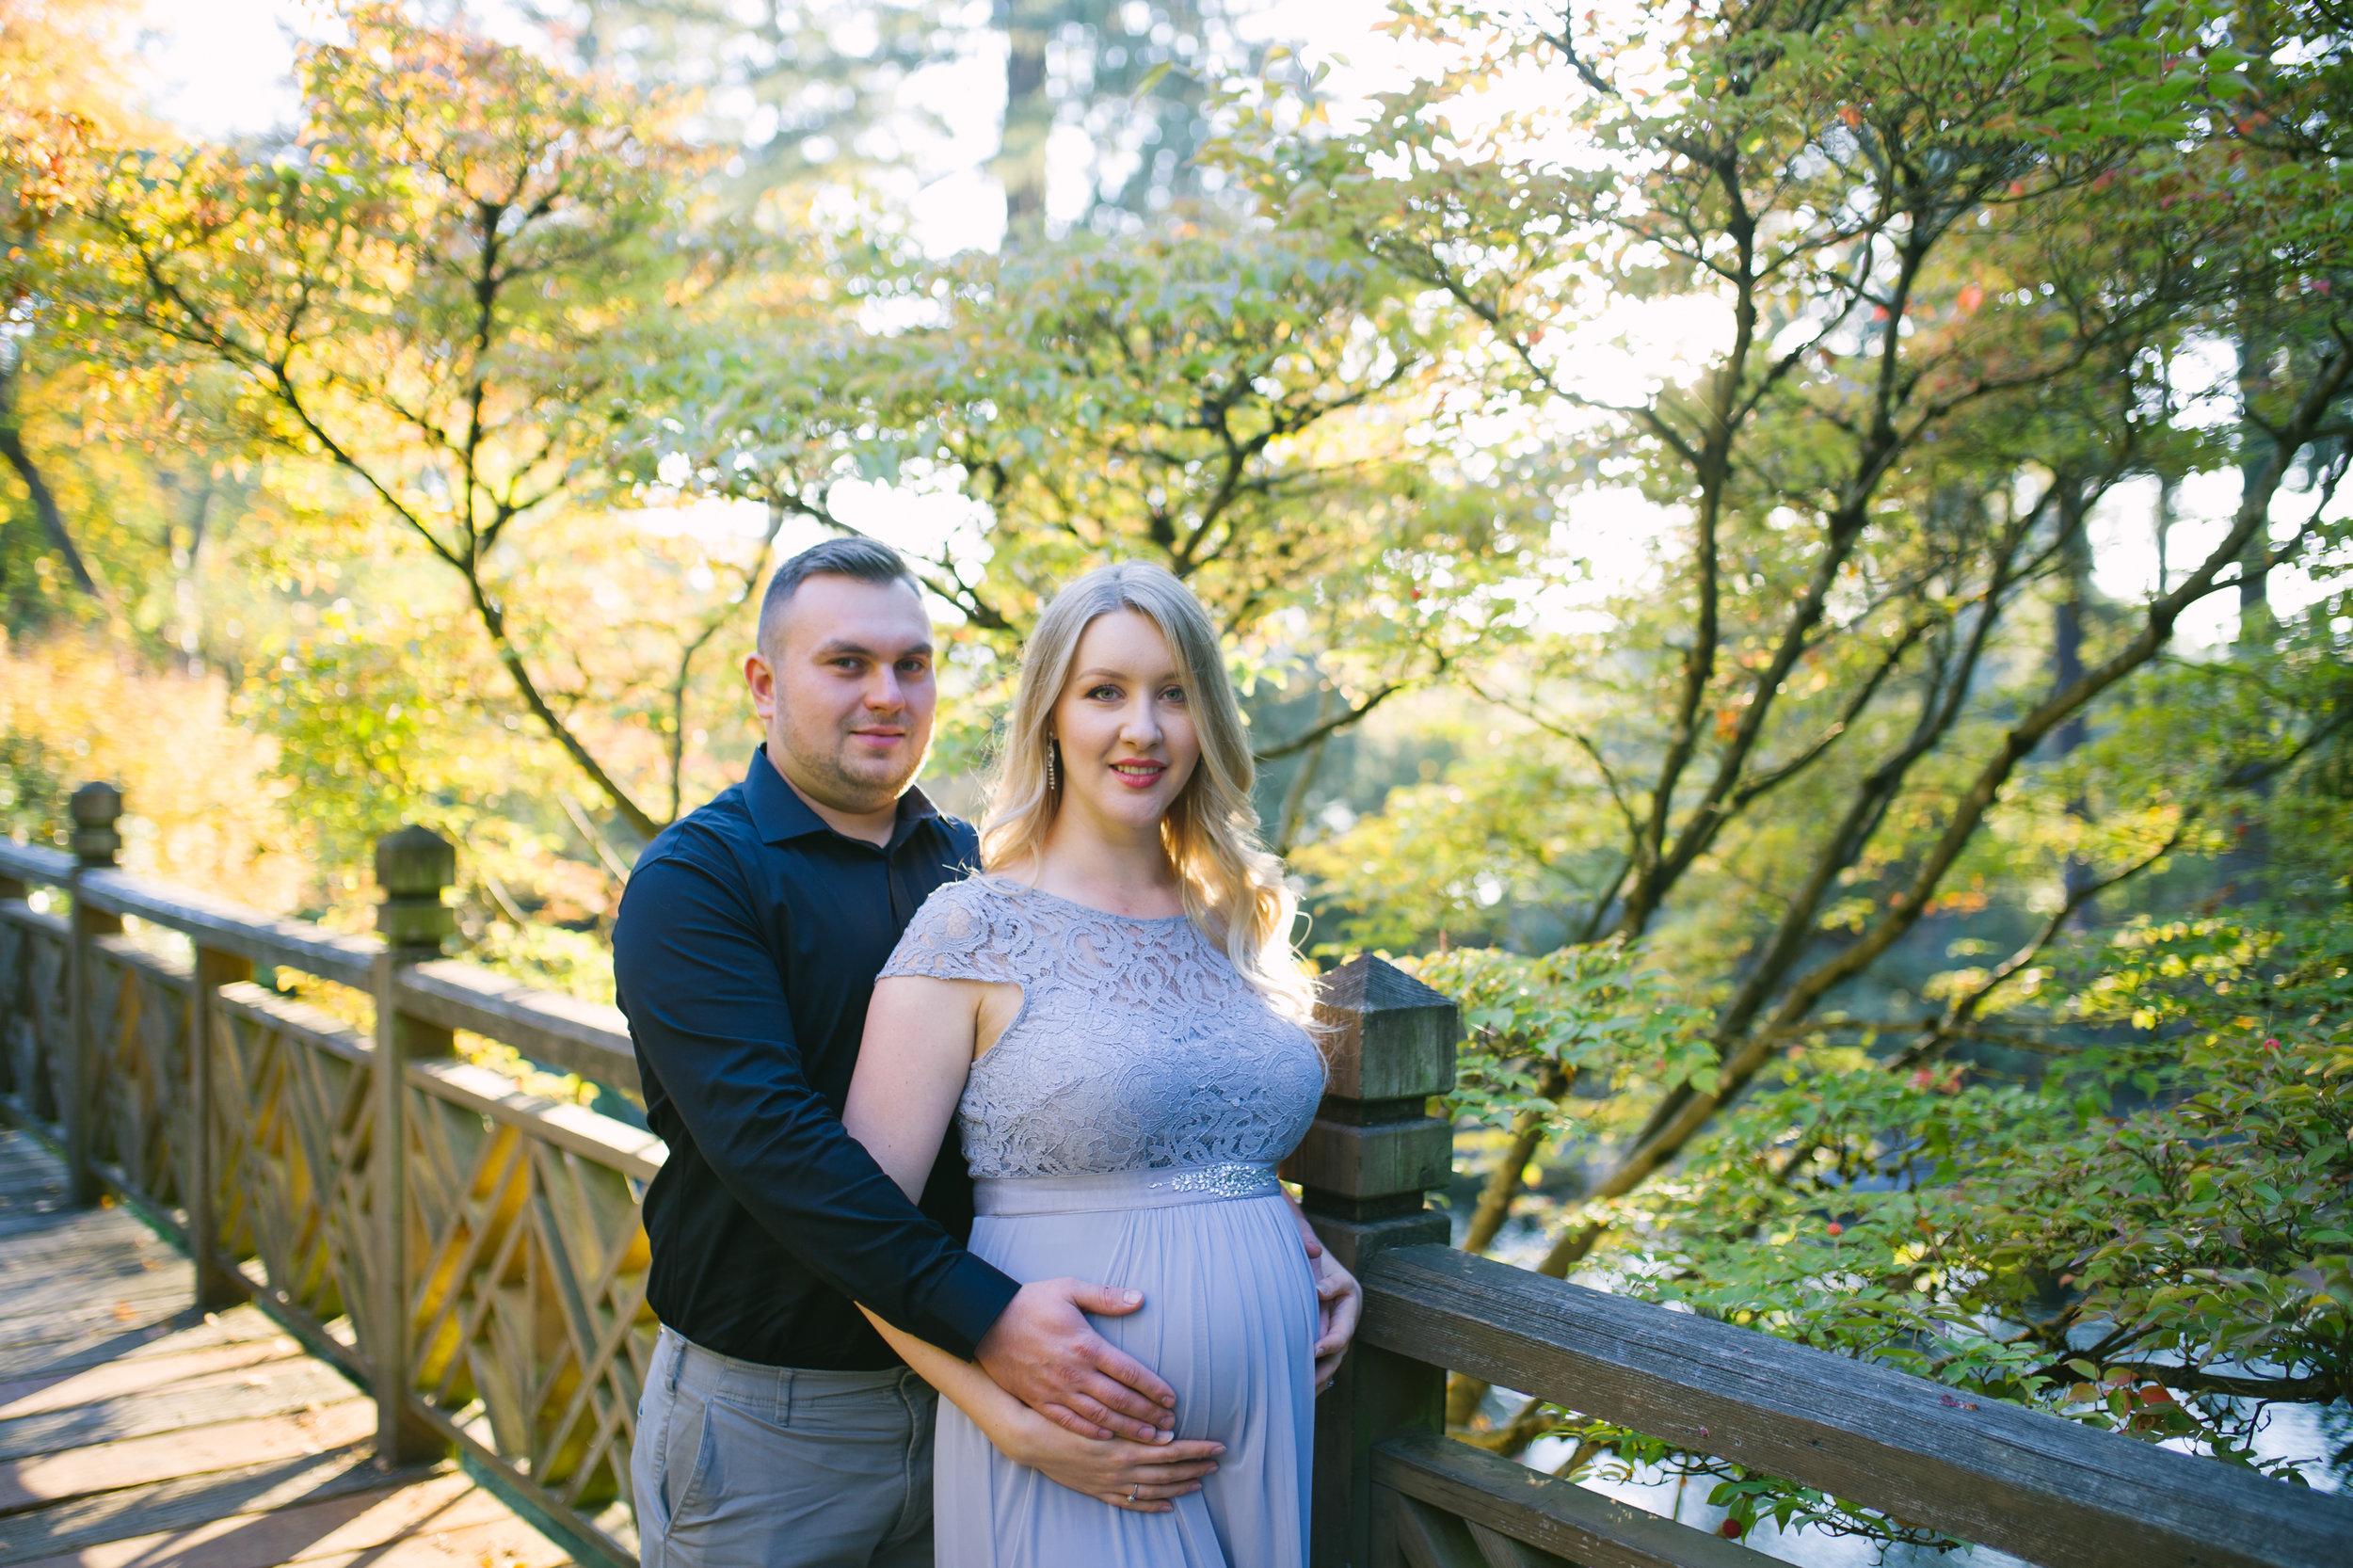 portland-maternity-photographer-64.jpg